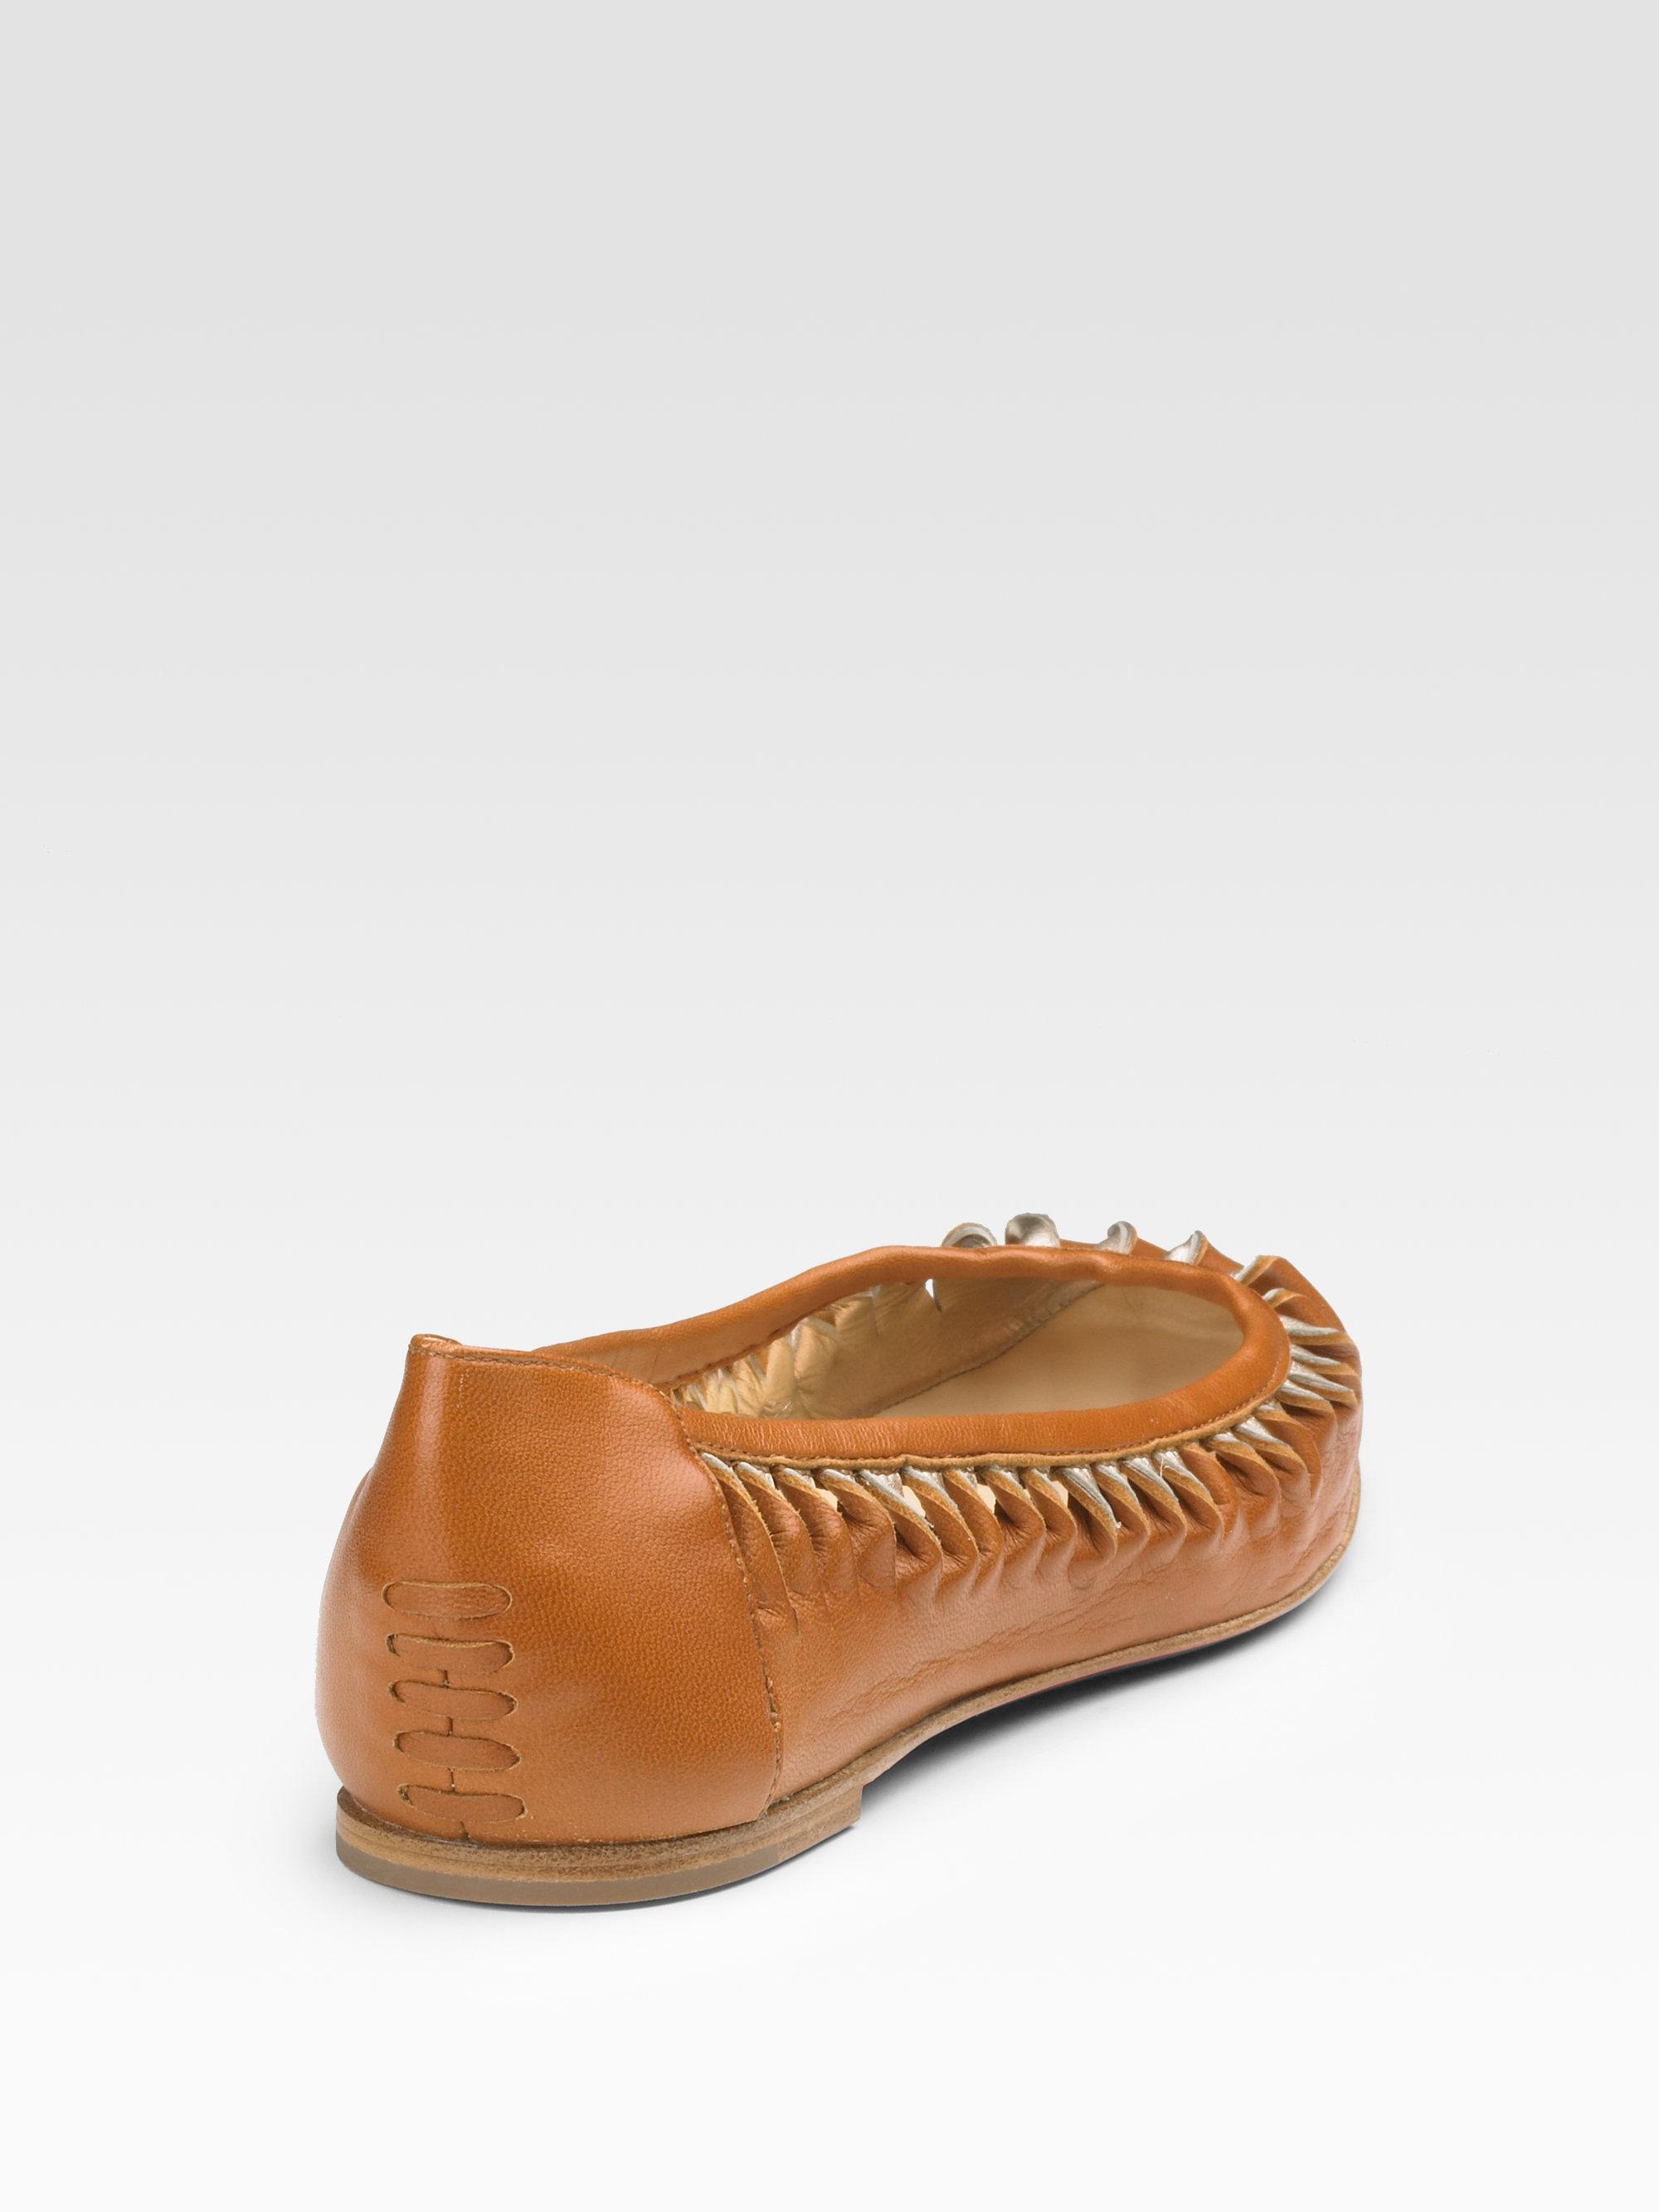 replica mens louis vuitton shoes - christian louboutin square-toe flats Black suede | cosmetics ...